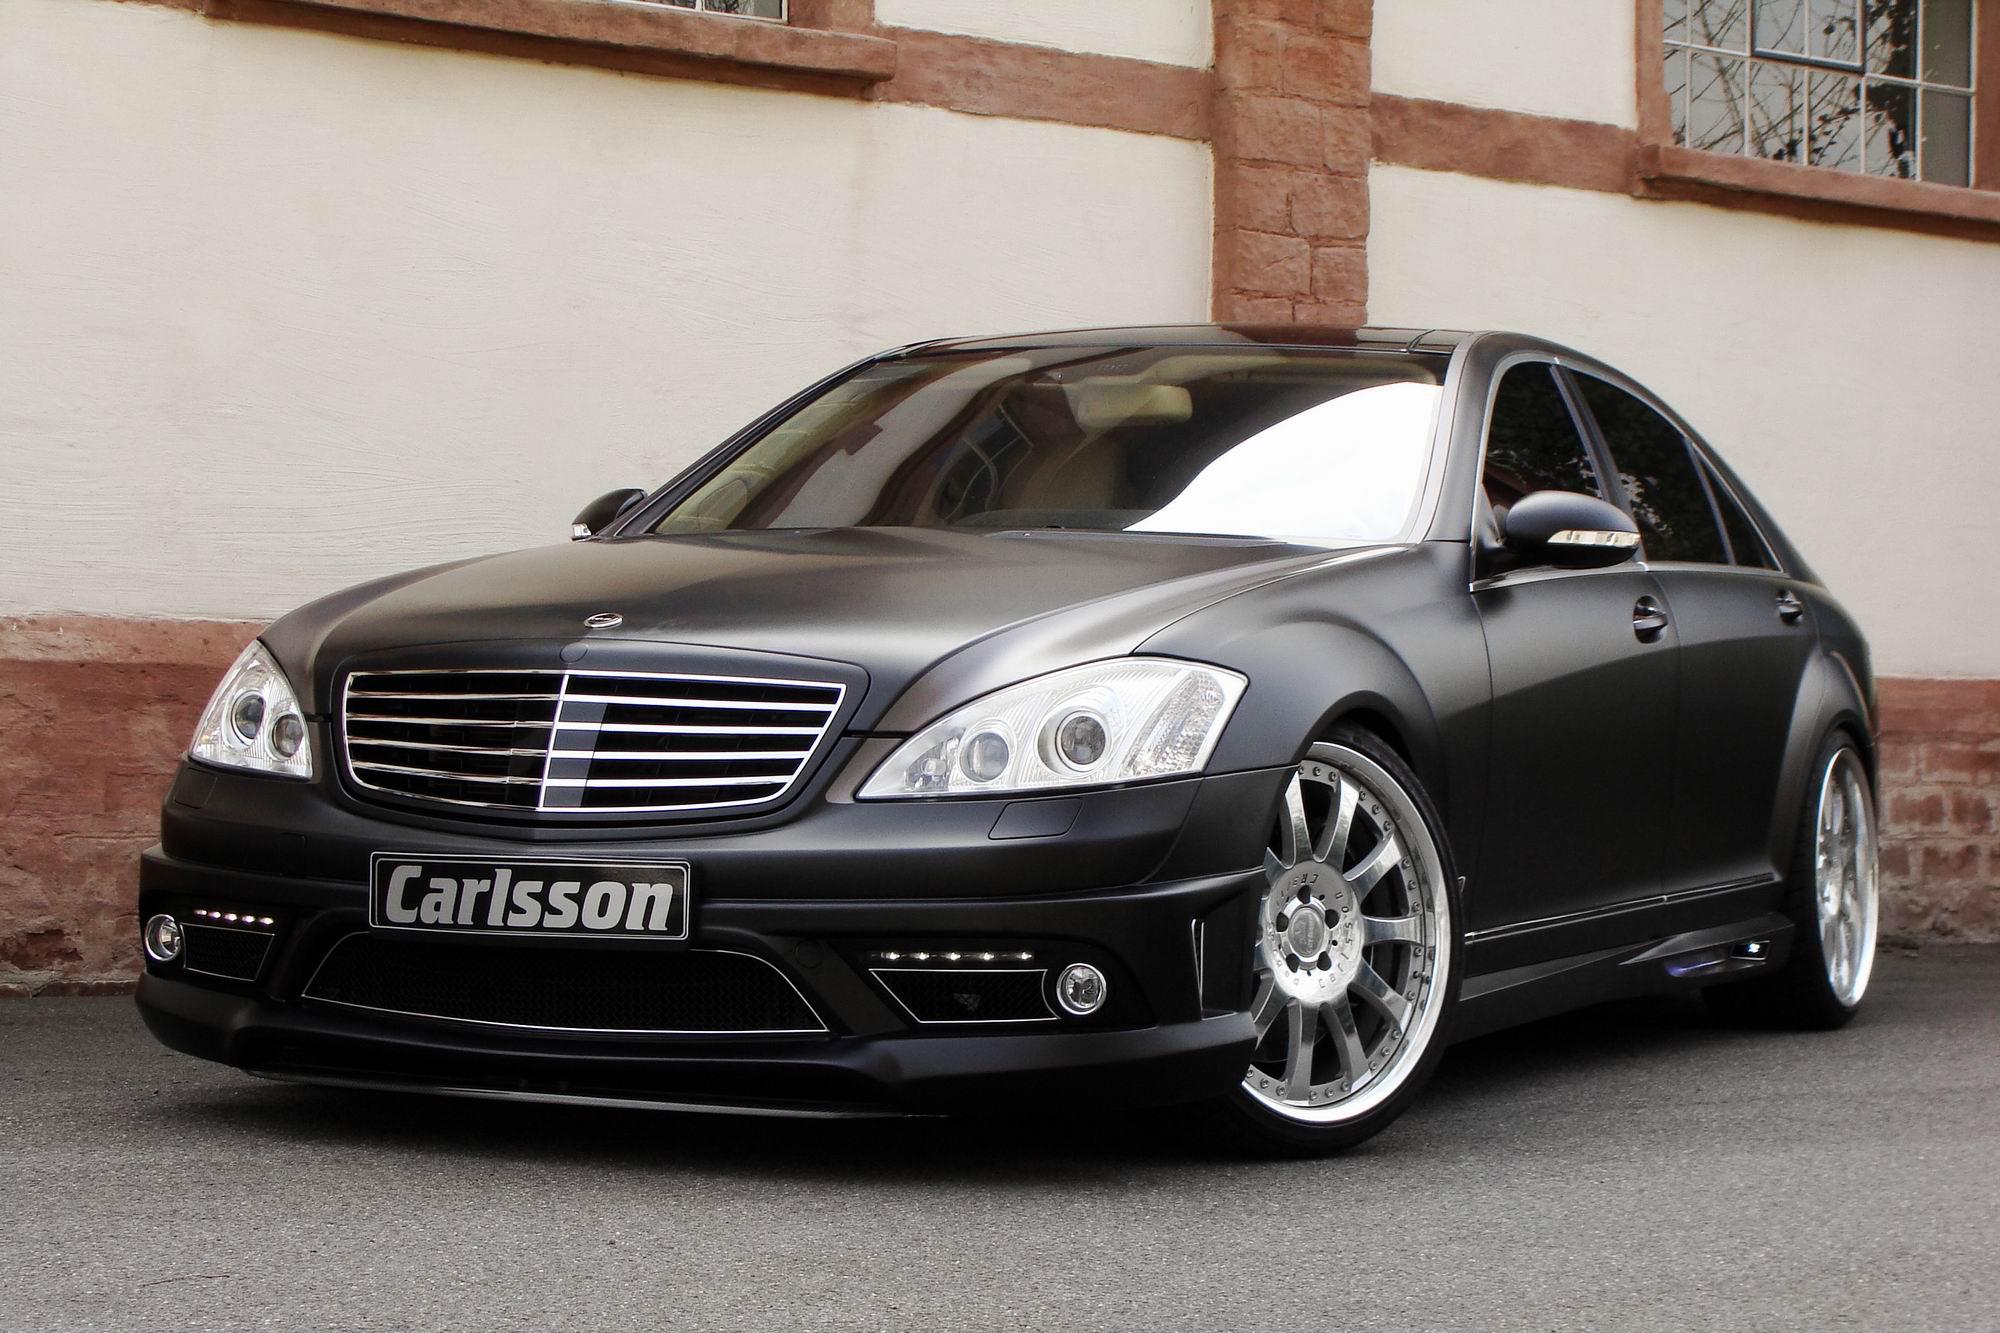 Image Source http://www.carlsson.de/carlsson/en/products/S-Class/carlsson_s-klasse_v221.php